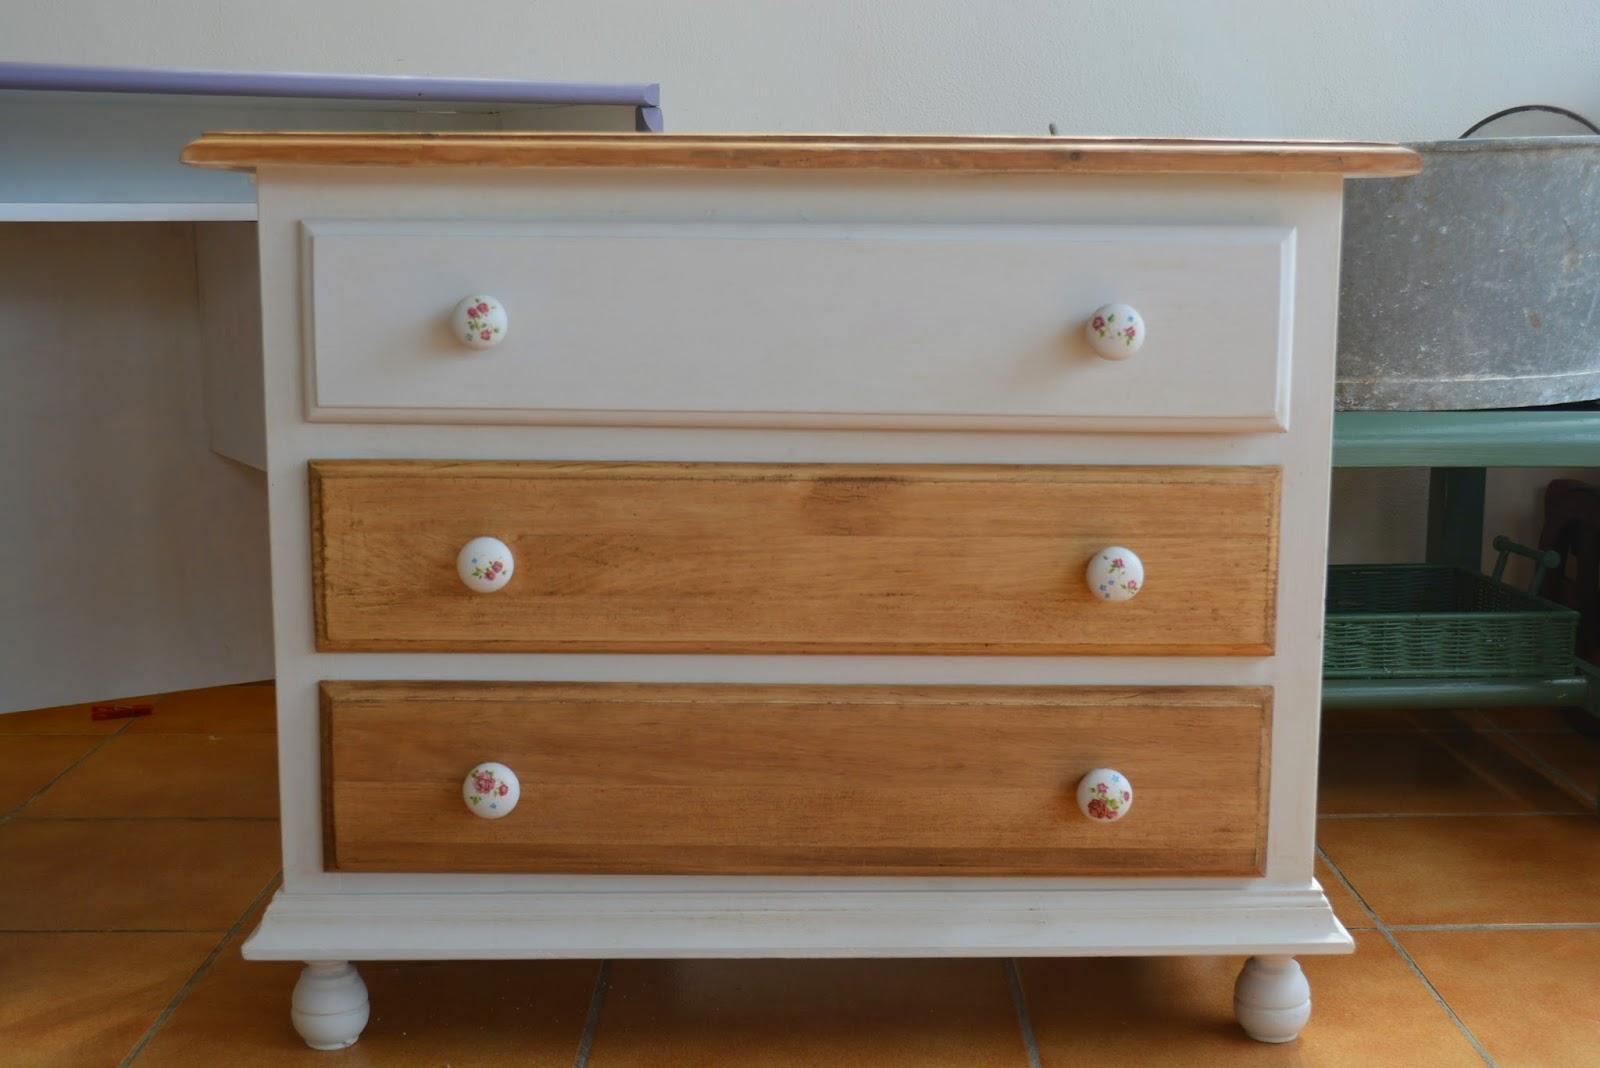 Mermelada de tomate mueble restaurado - Muebles de colores pintados ...